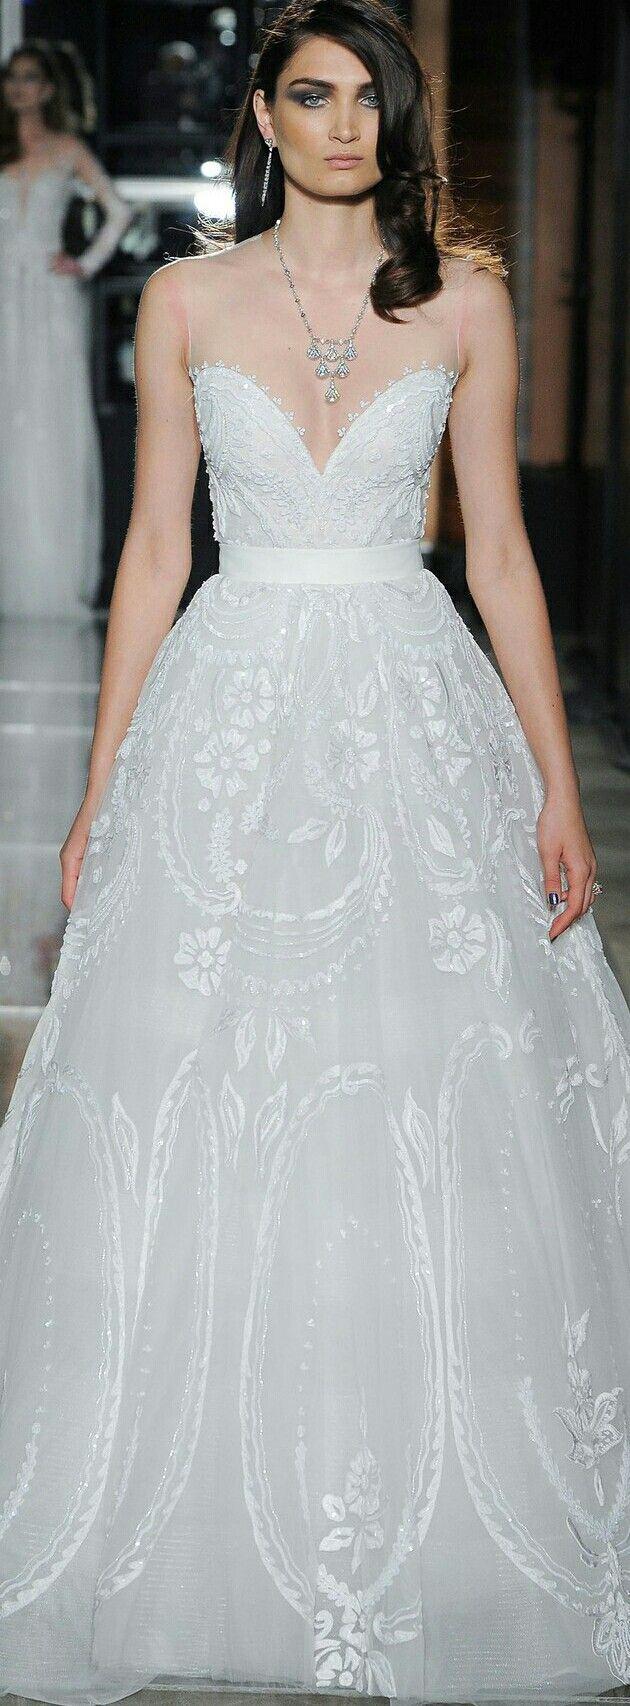 Pin by lona kern on wedding dresses in pinterest bridal